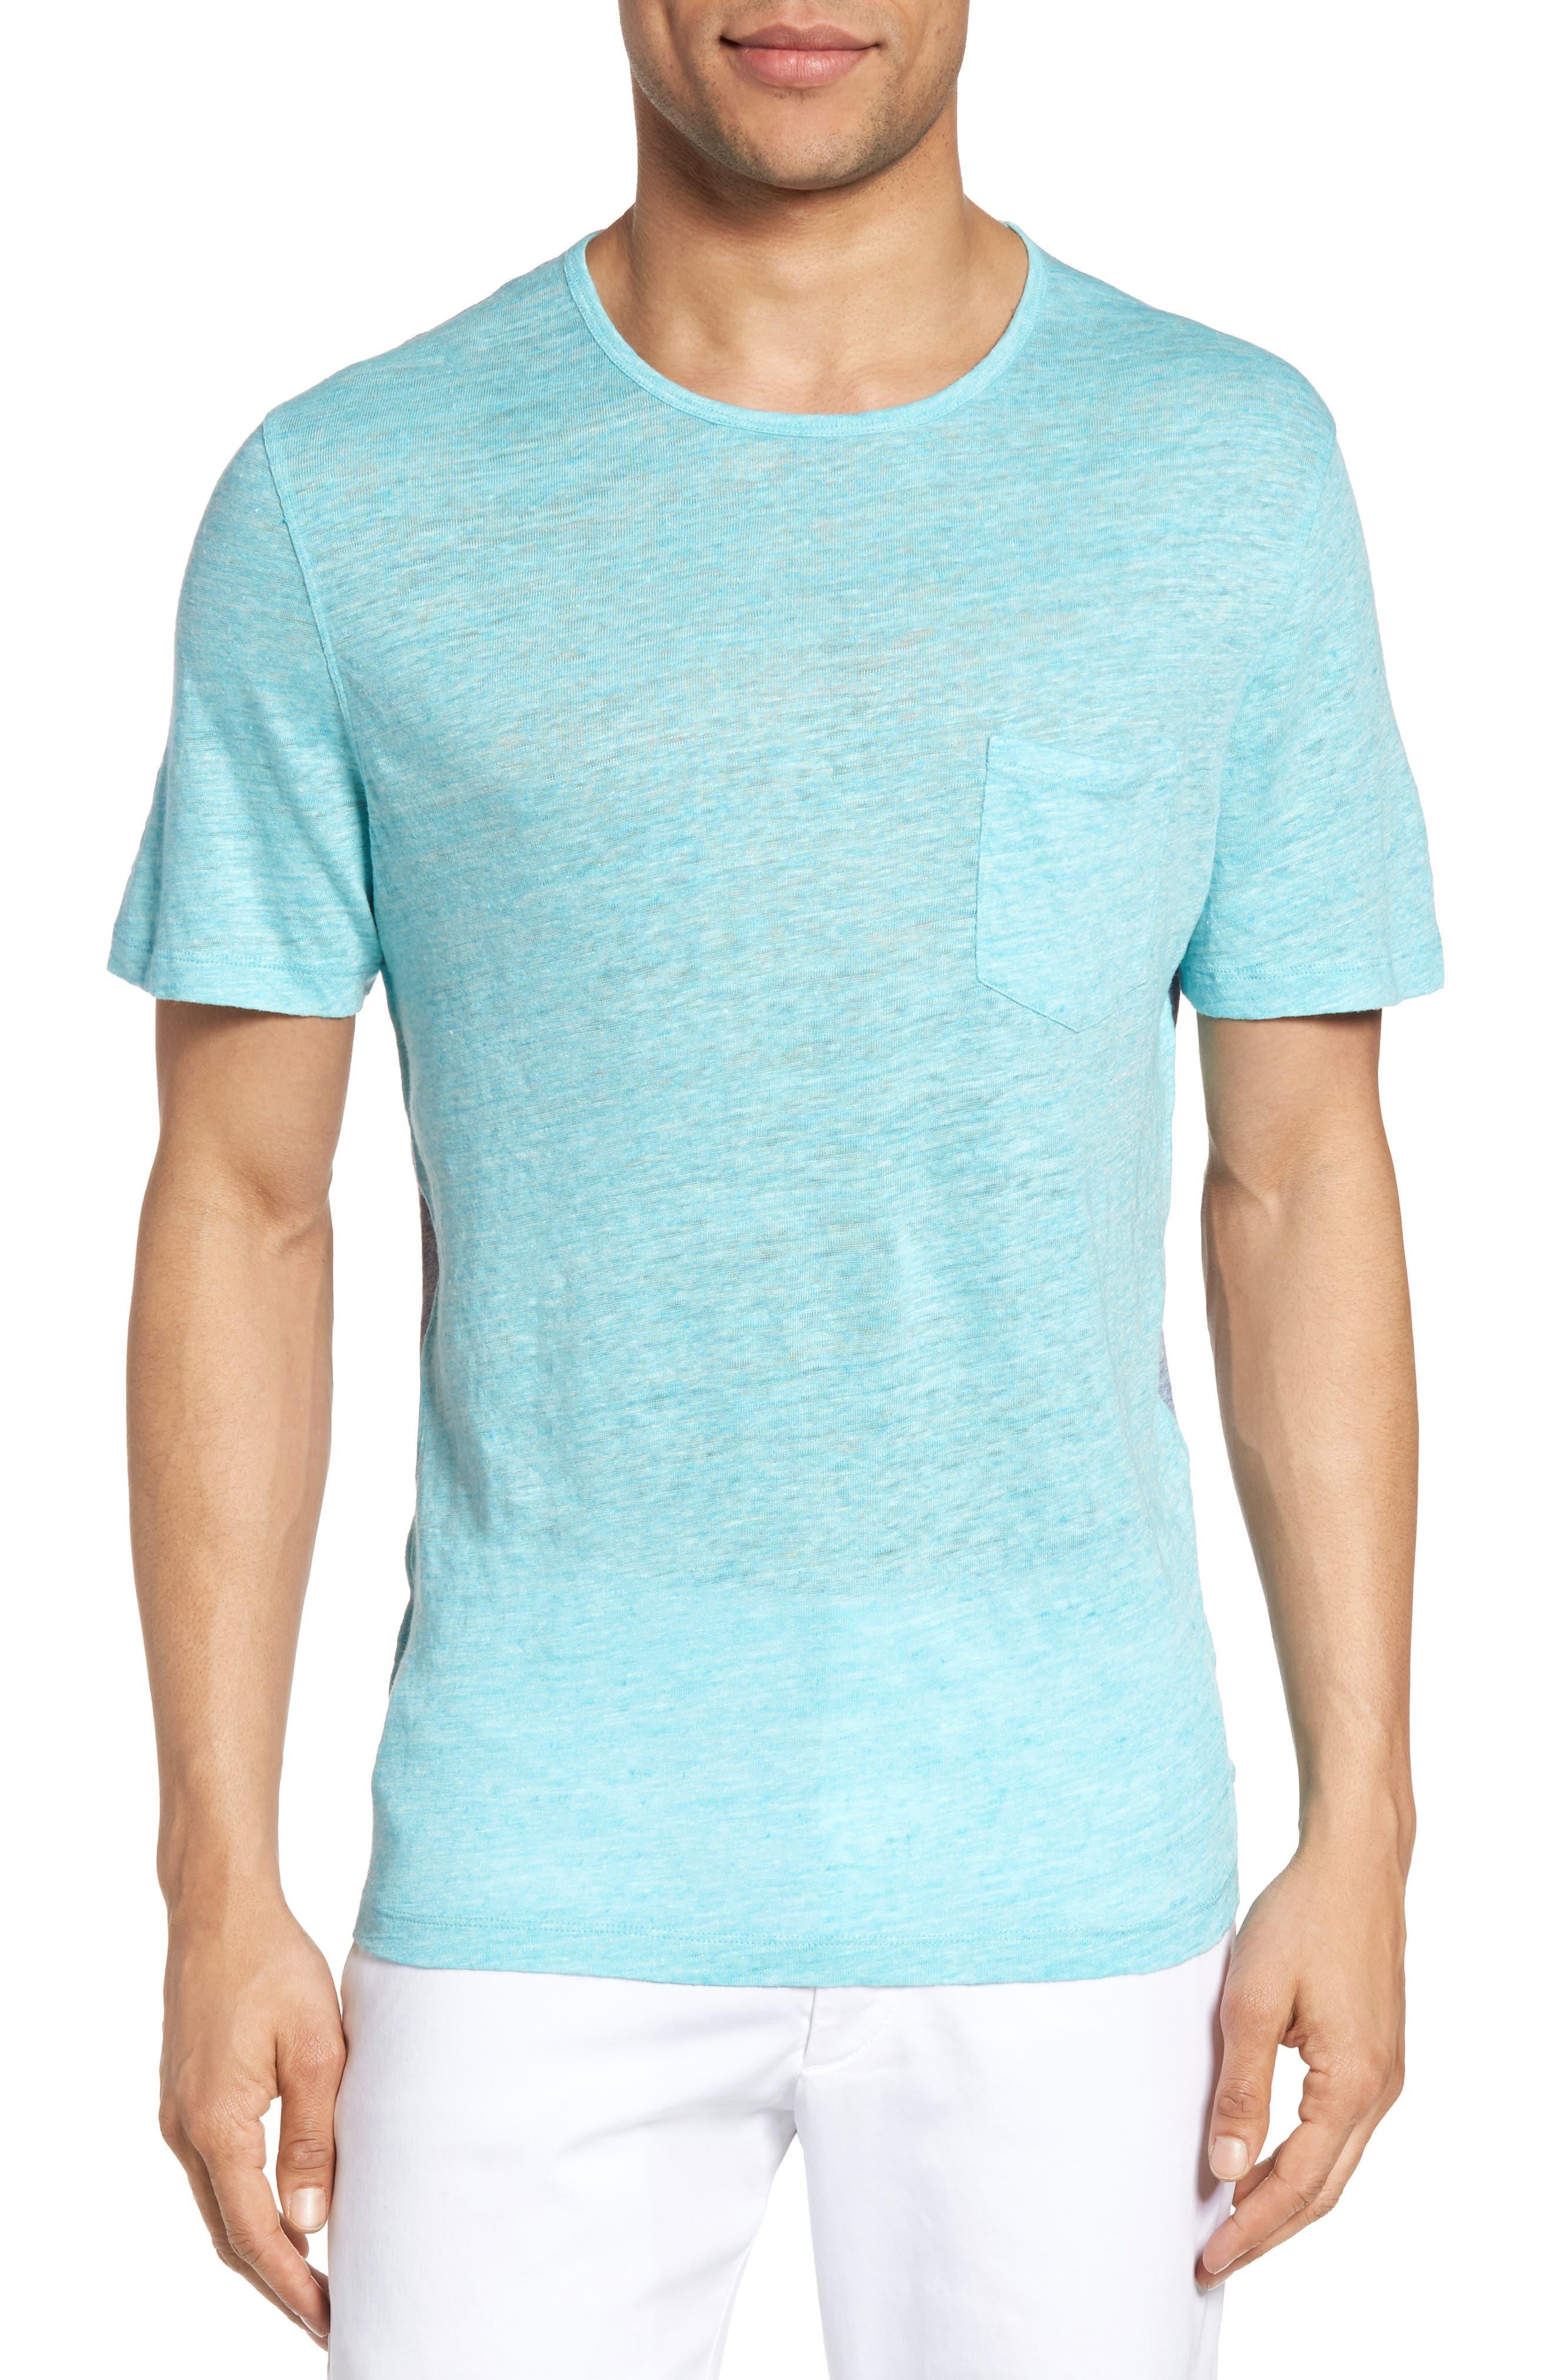 Main Image - Zachary Prell Monad Colorblock Linen T-Shirt